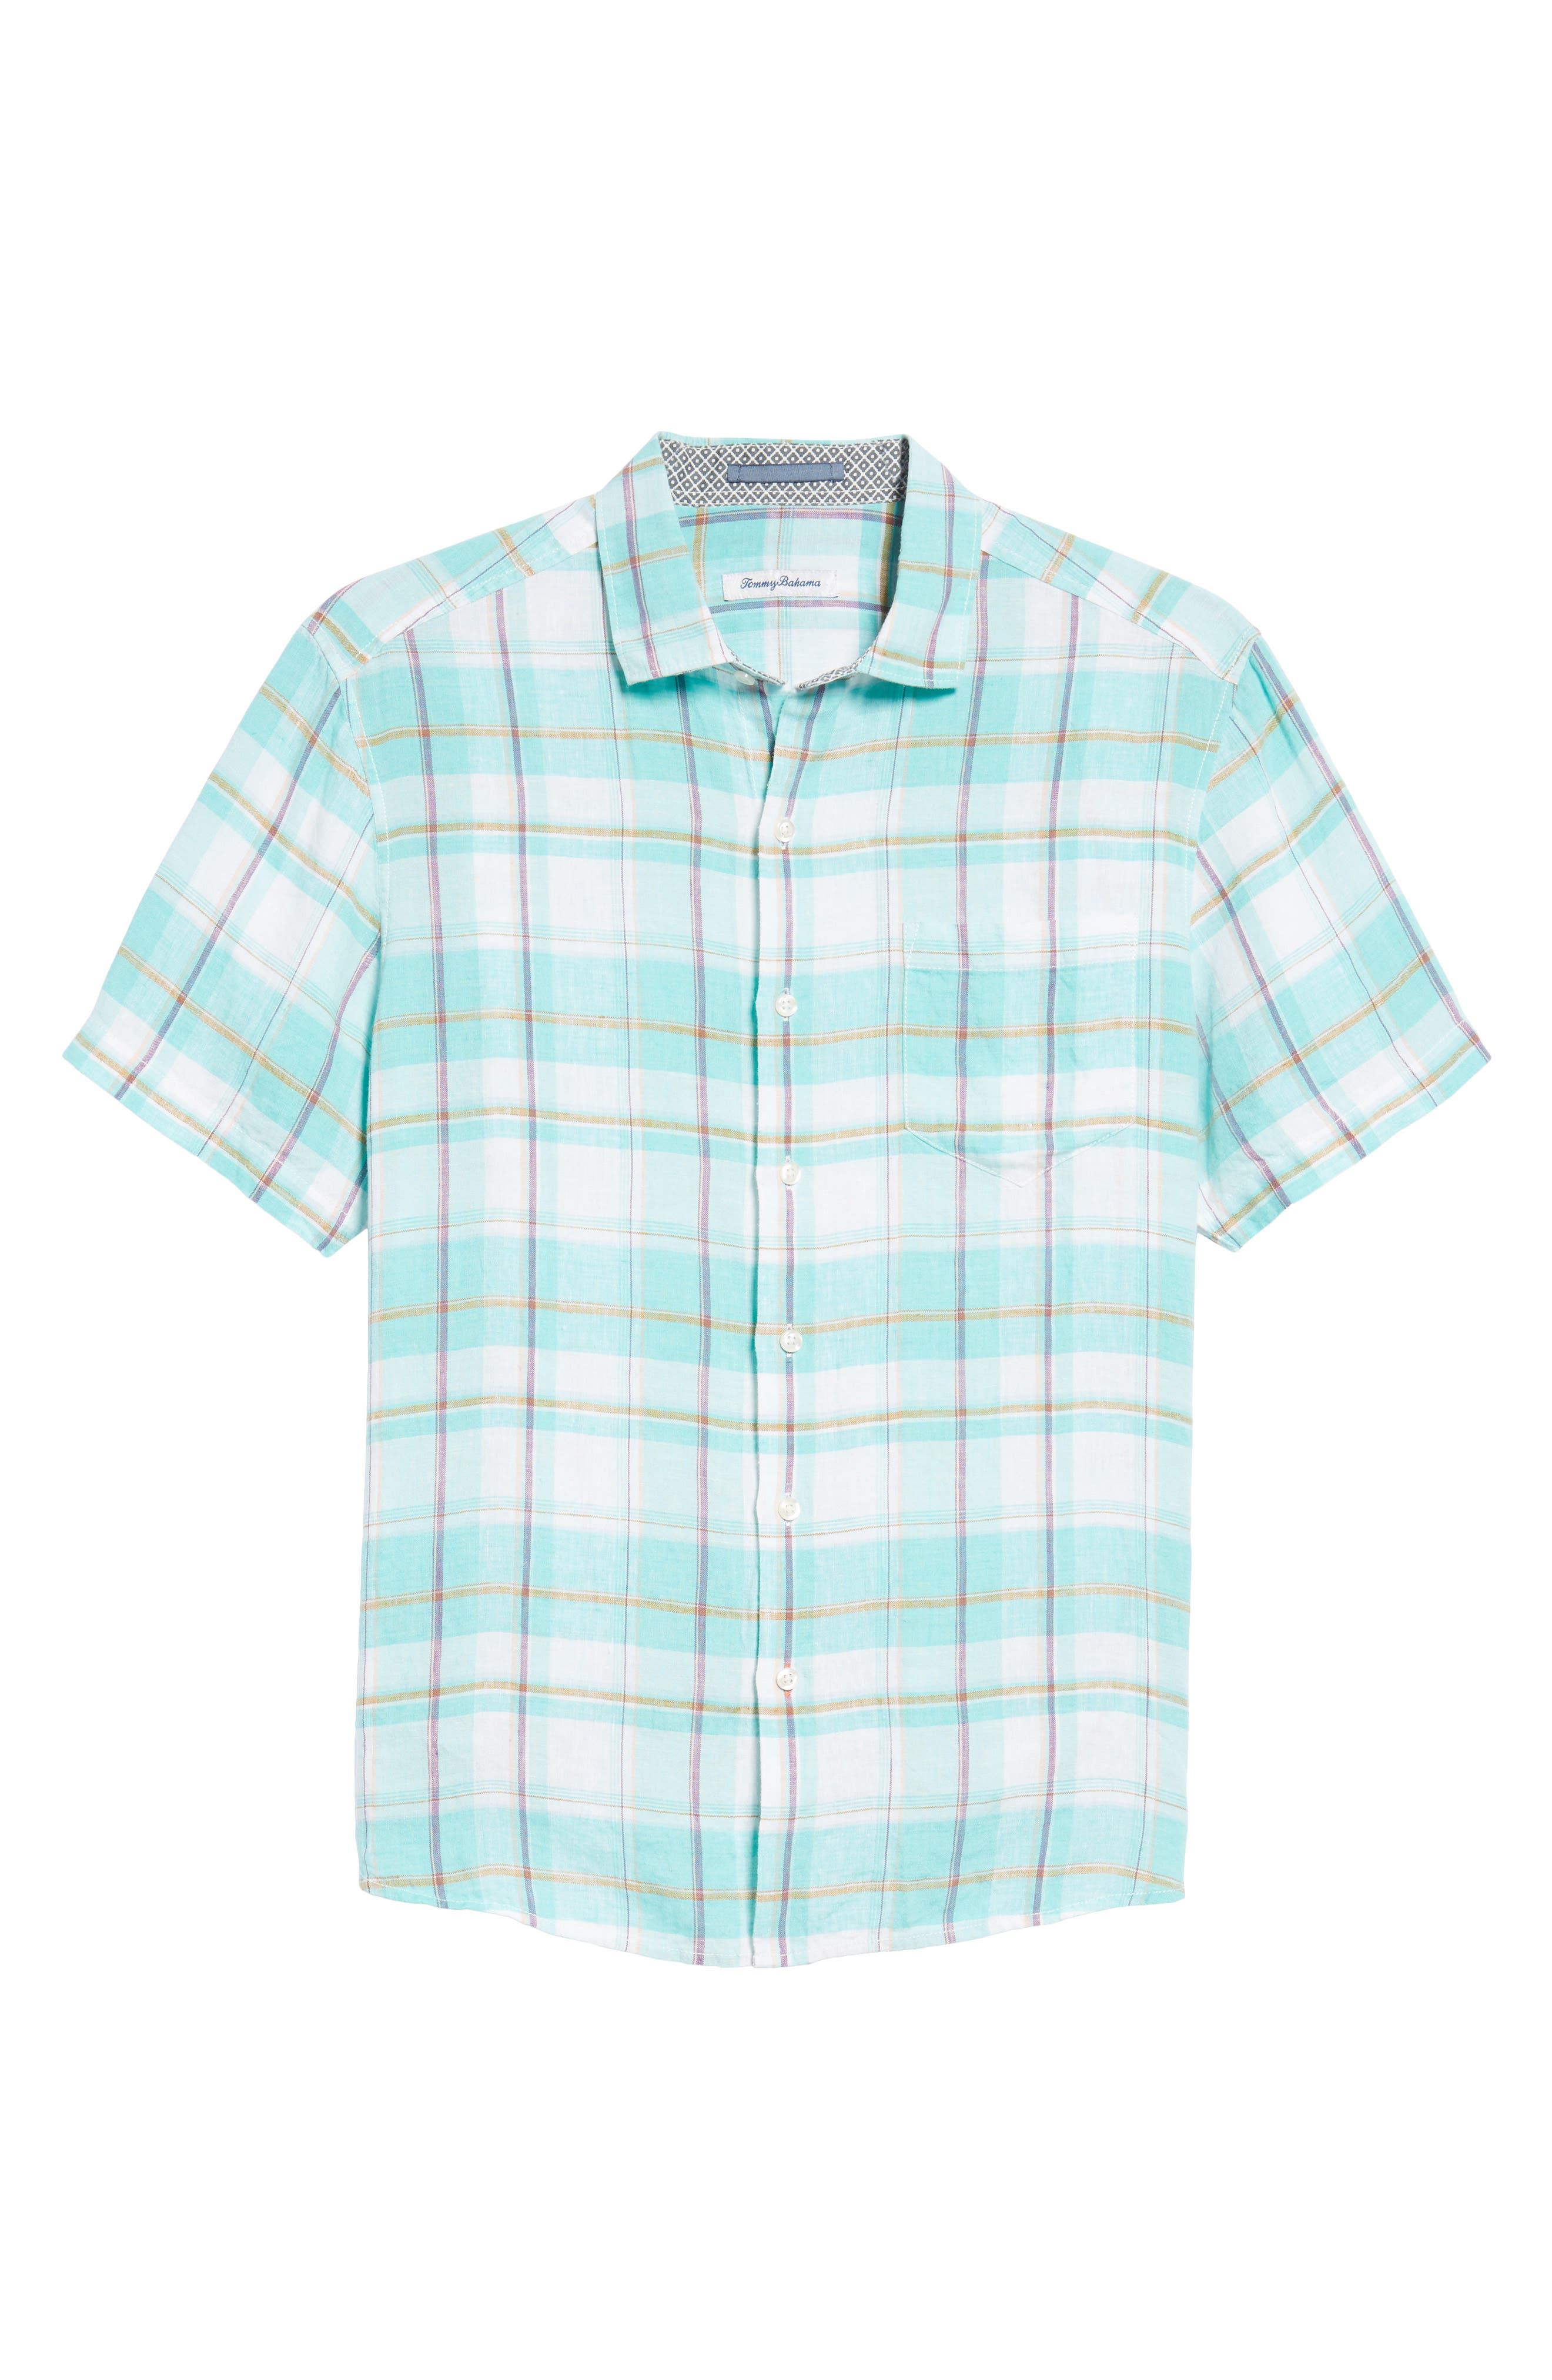 Lauderdale Regular Fit Sport Shirt,                             Alternate thumbnail 6, color,                             Dusty Aqua